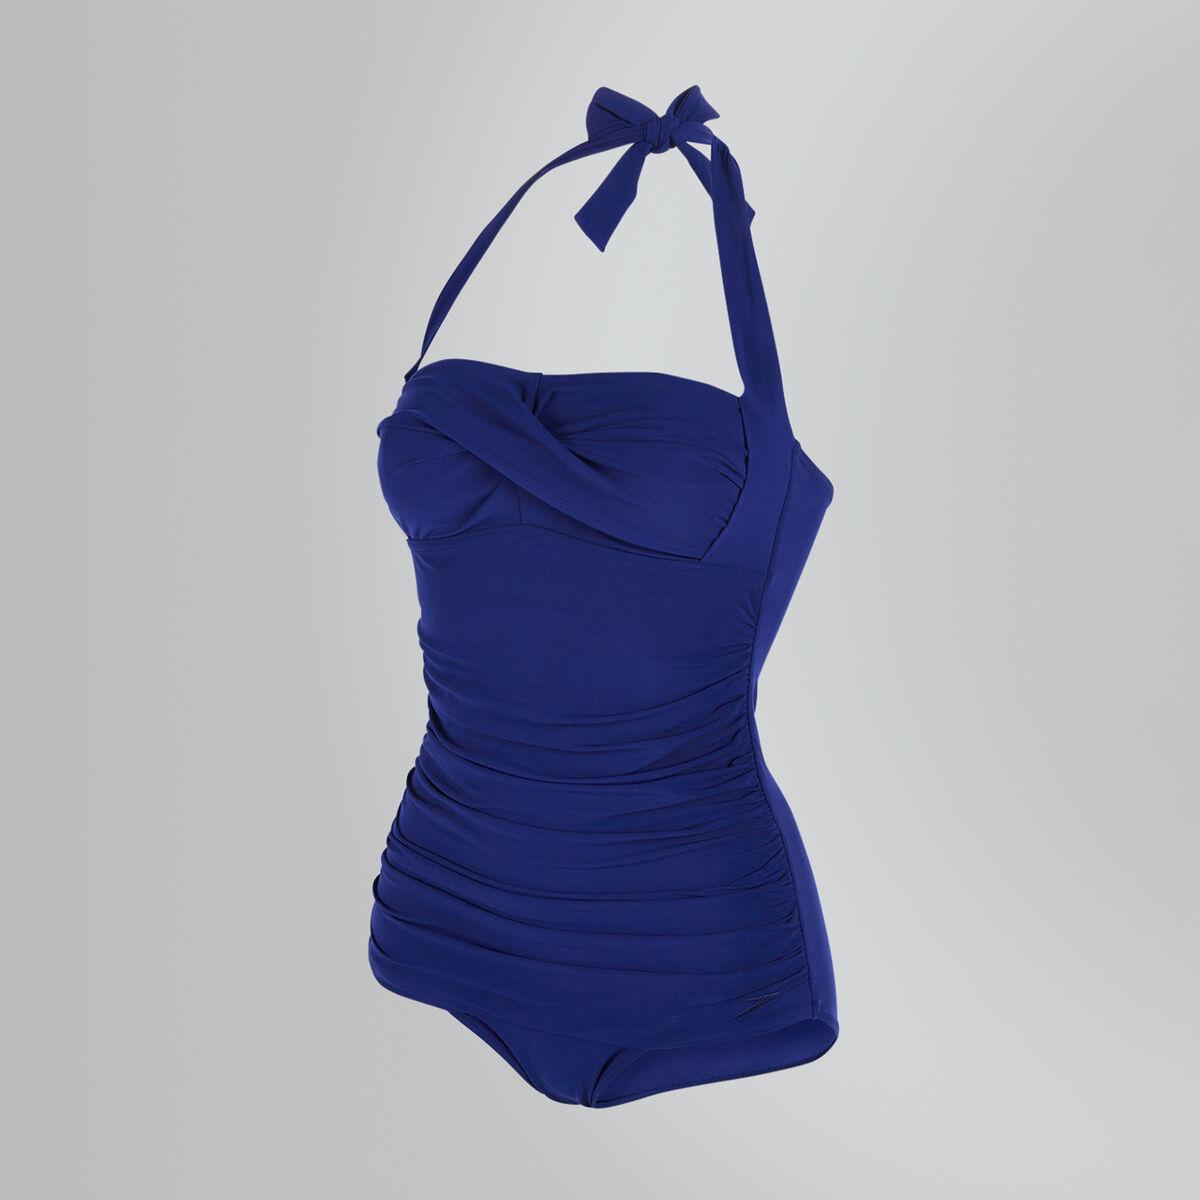 Women's Sculpture Crystalsun Swimsuit